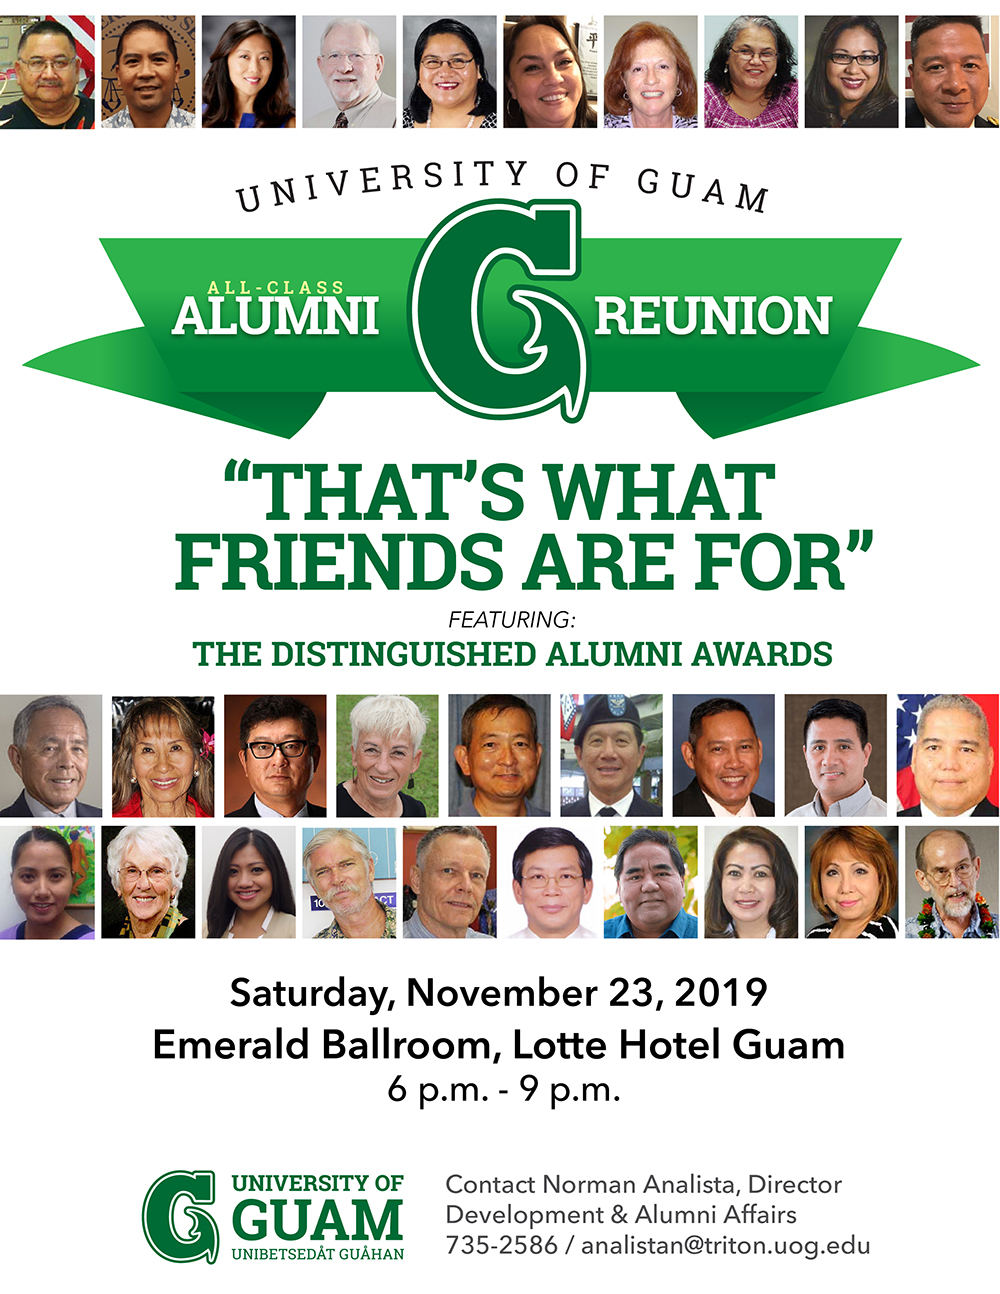 All-Class Alumni Reunion and Distinguished Alumni Awards